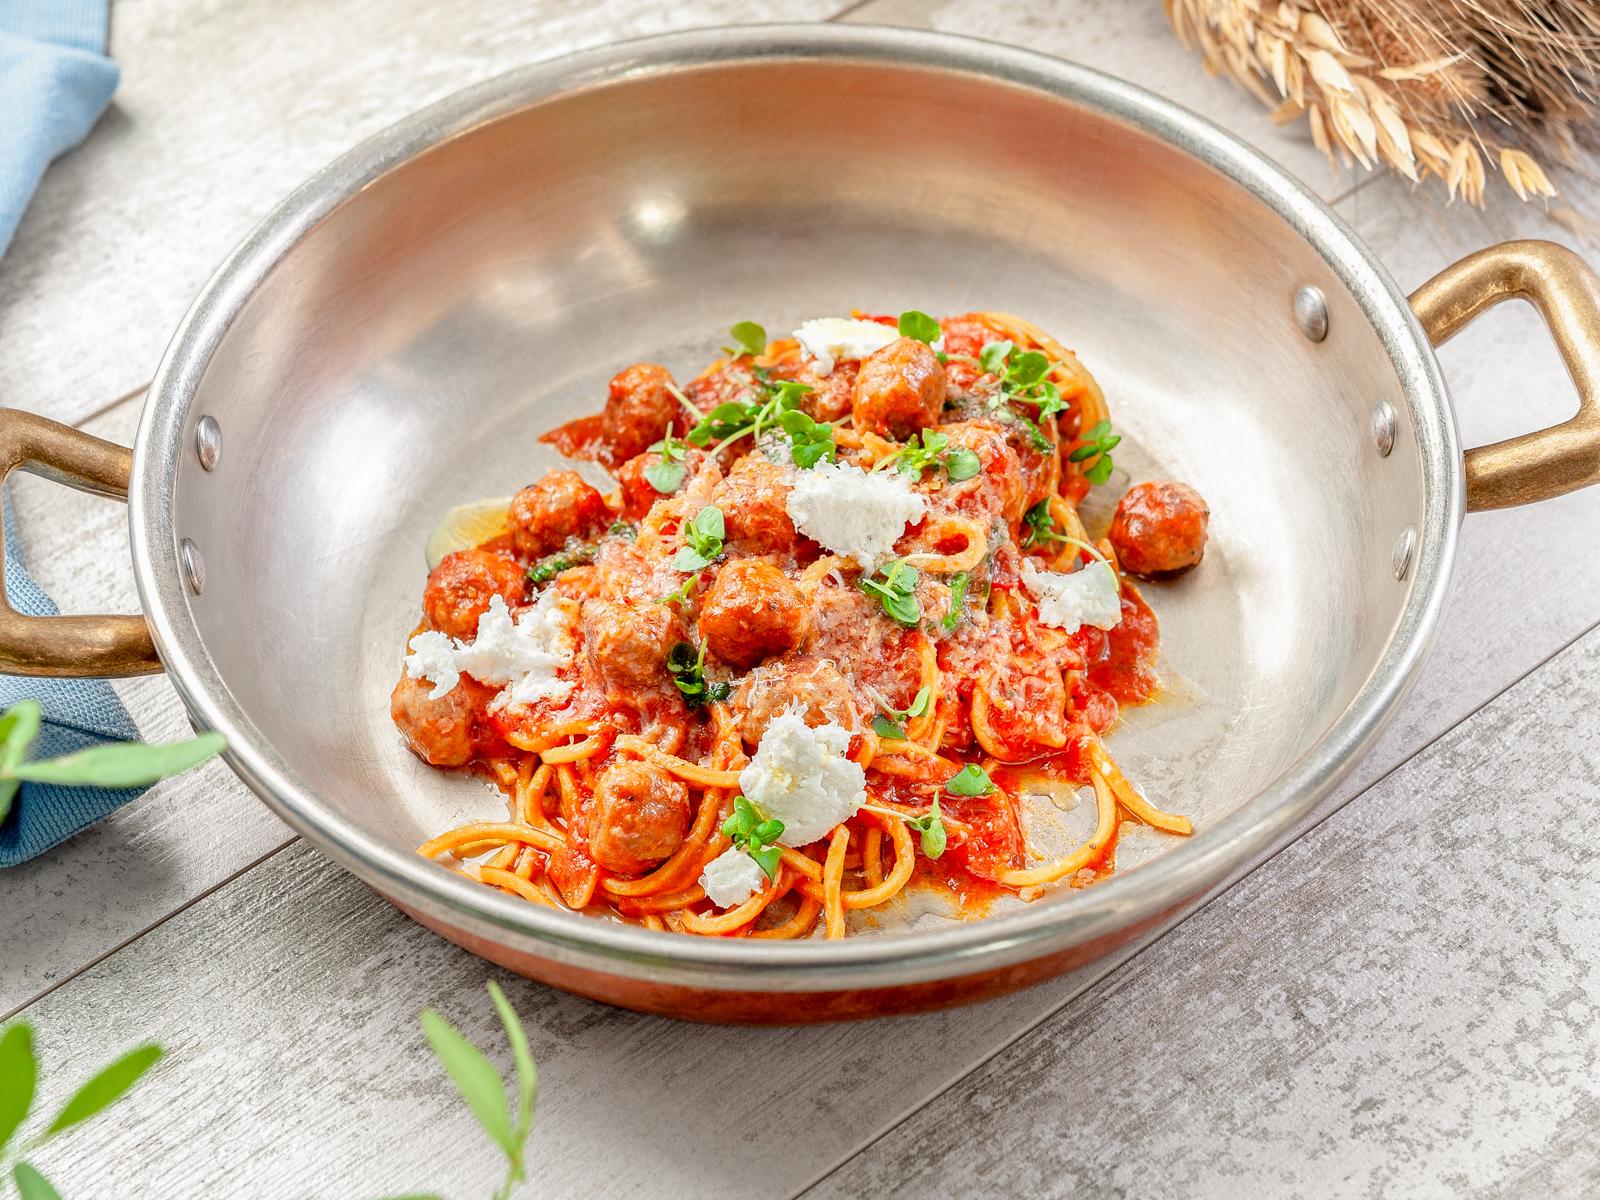 Спагетти китарра с фрикадельками